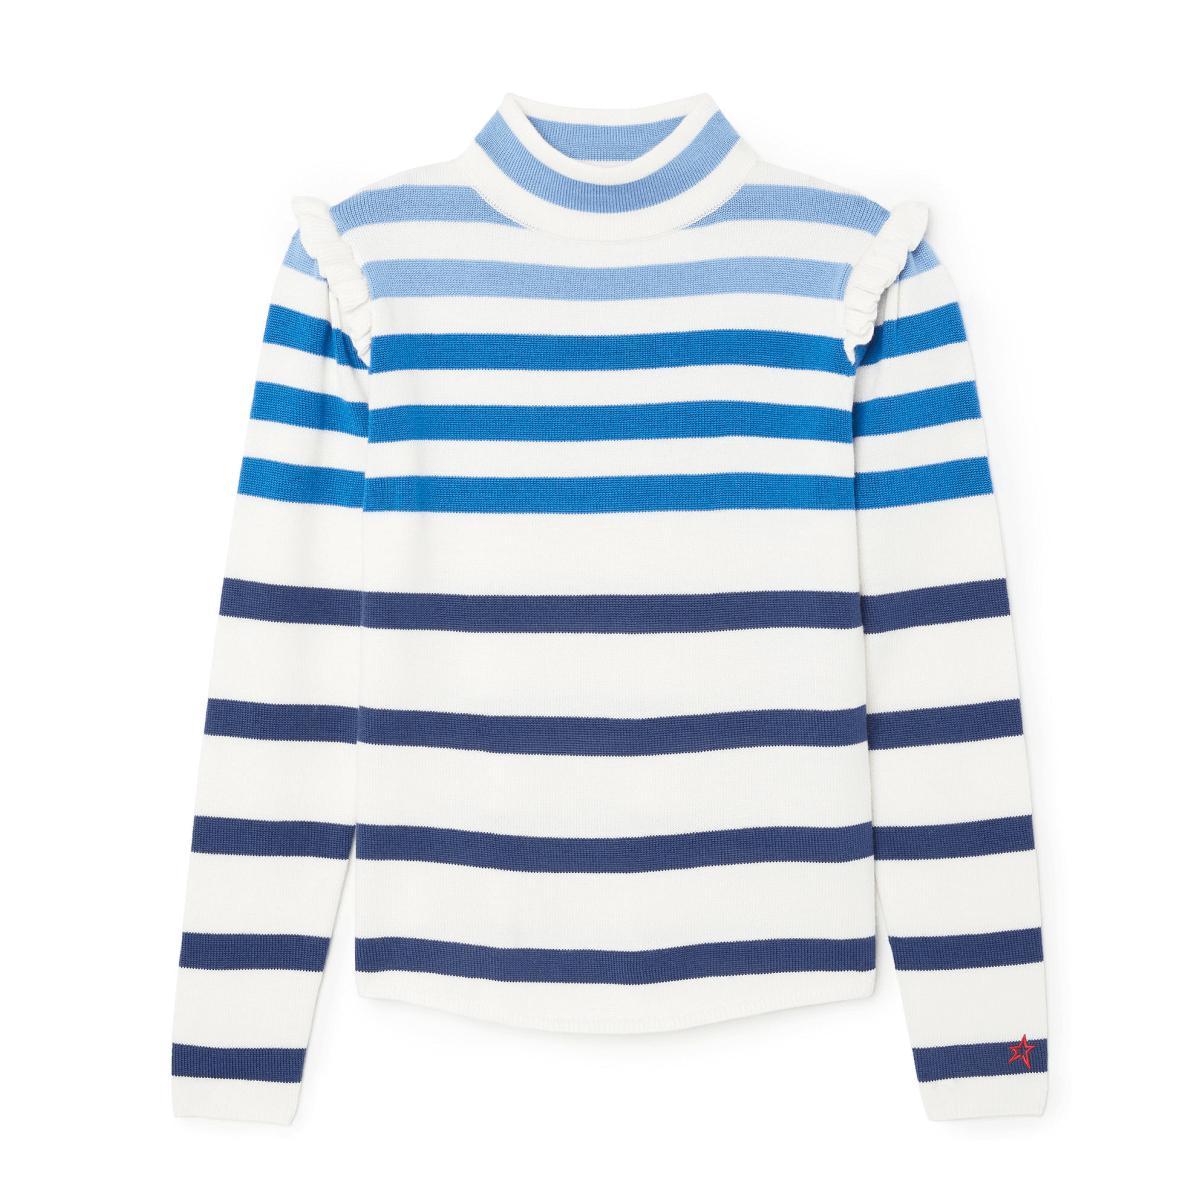 goop x Perfect Moment Rainbow Sweater